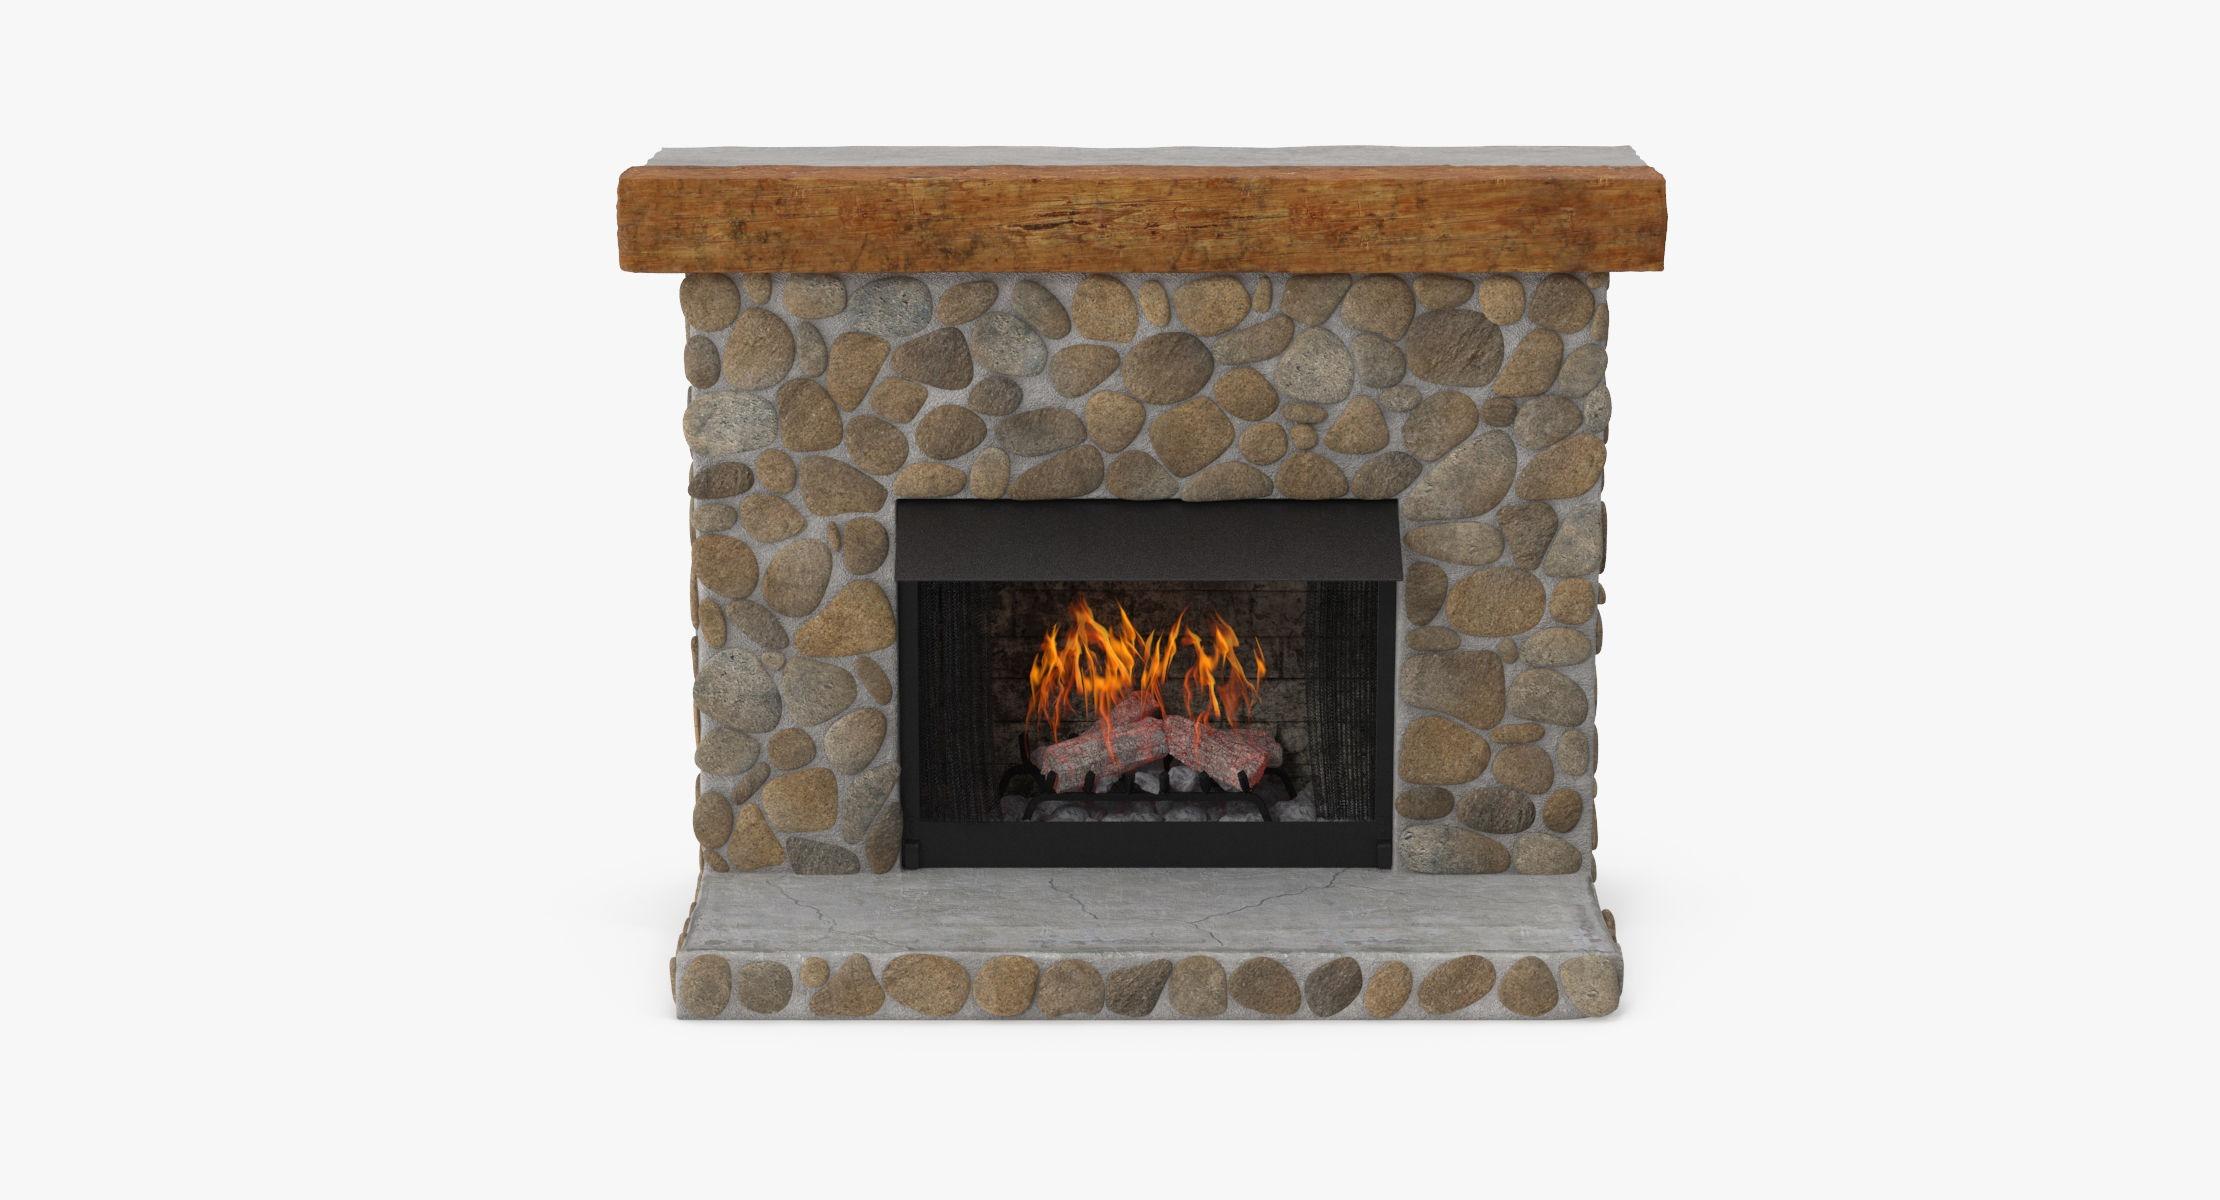 Fire Place - reel 1